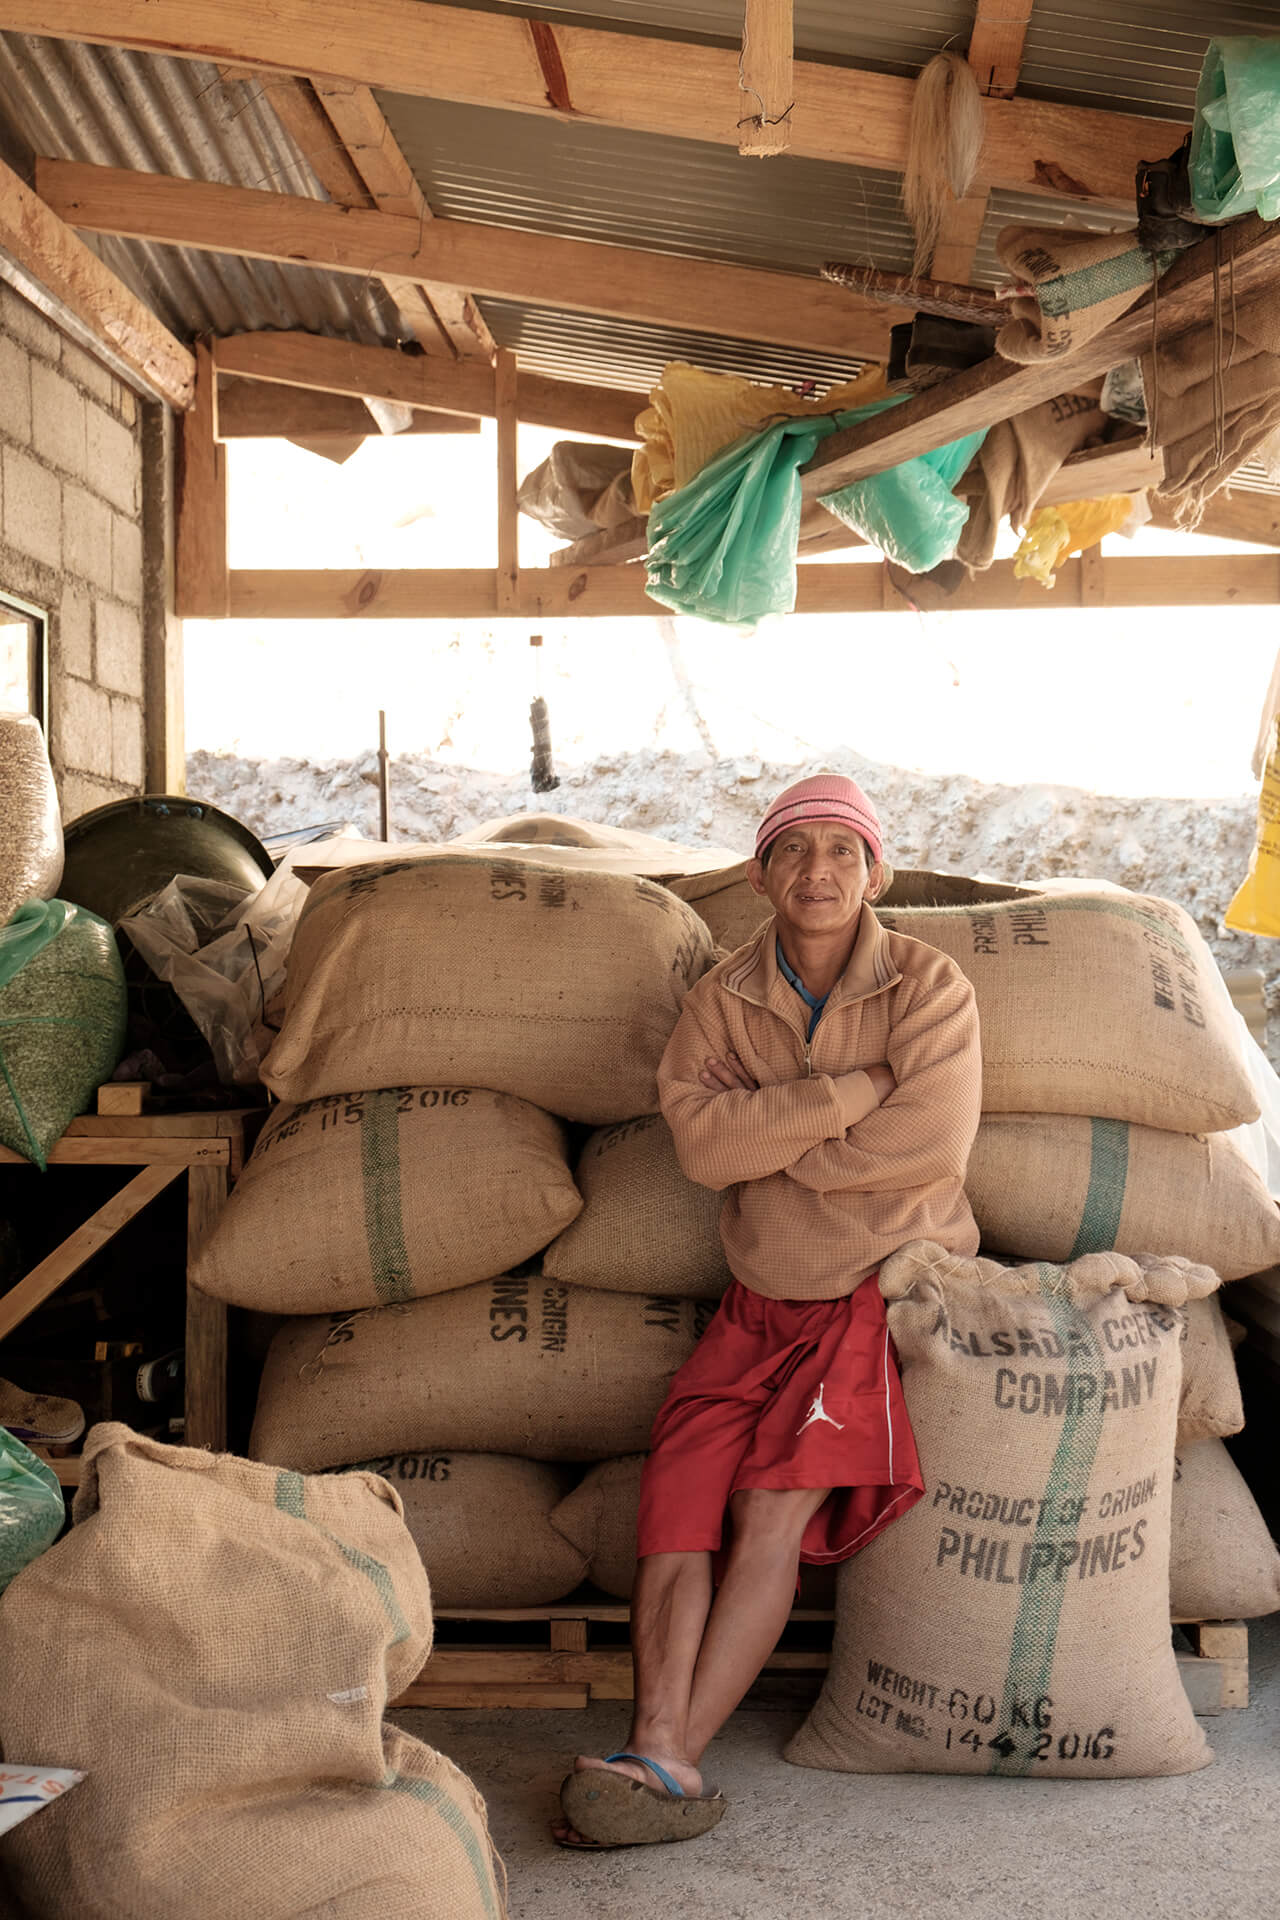 UNCLE SERAFIN. Community leader, farmer, head carpenter and Kalsada Krew's main cheerleader.